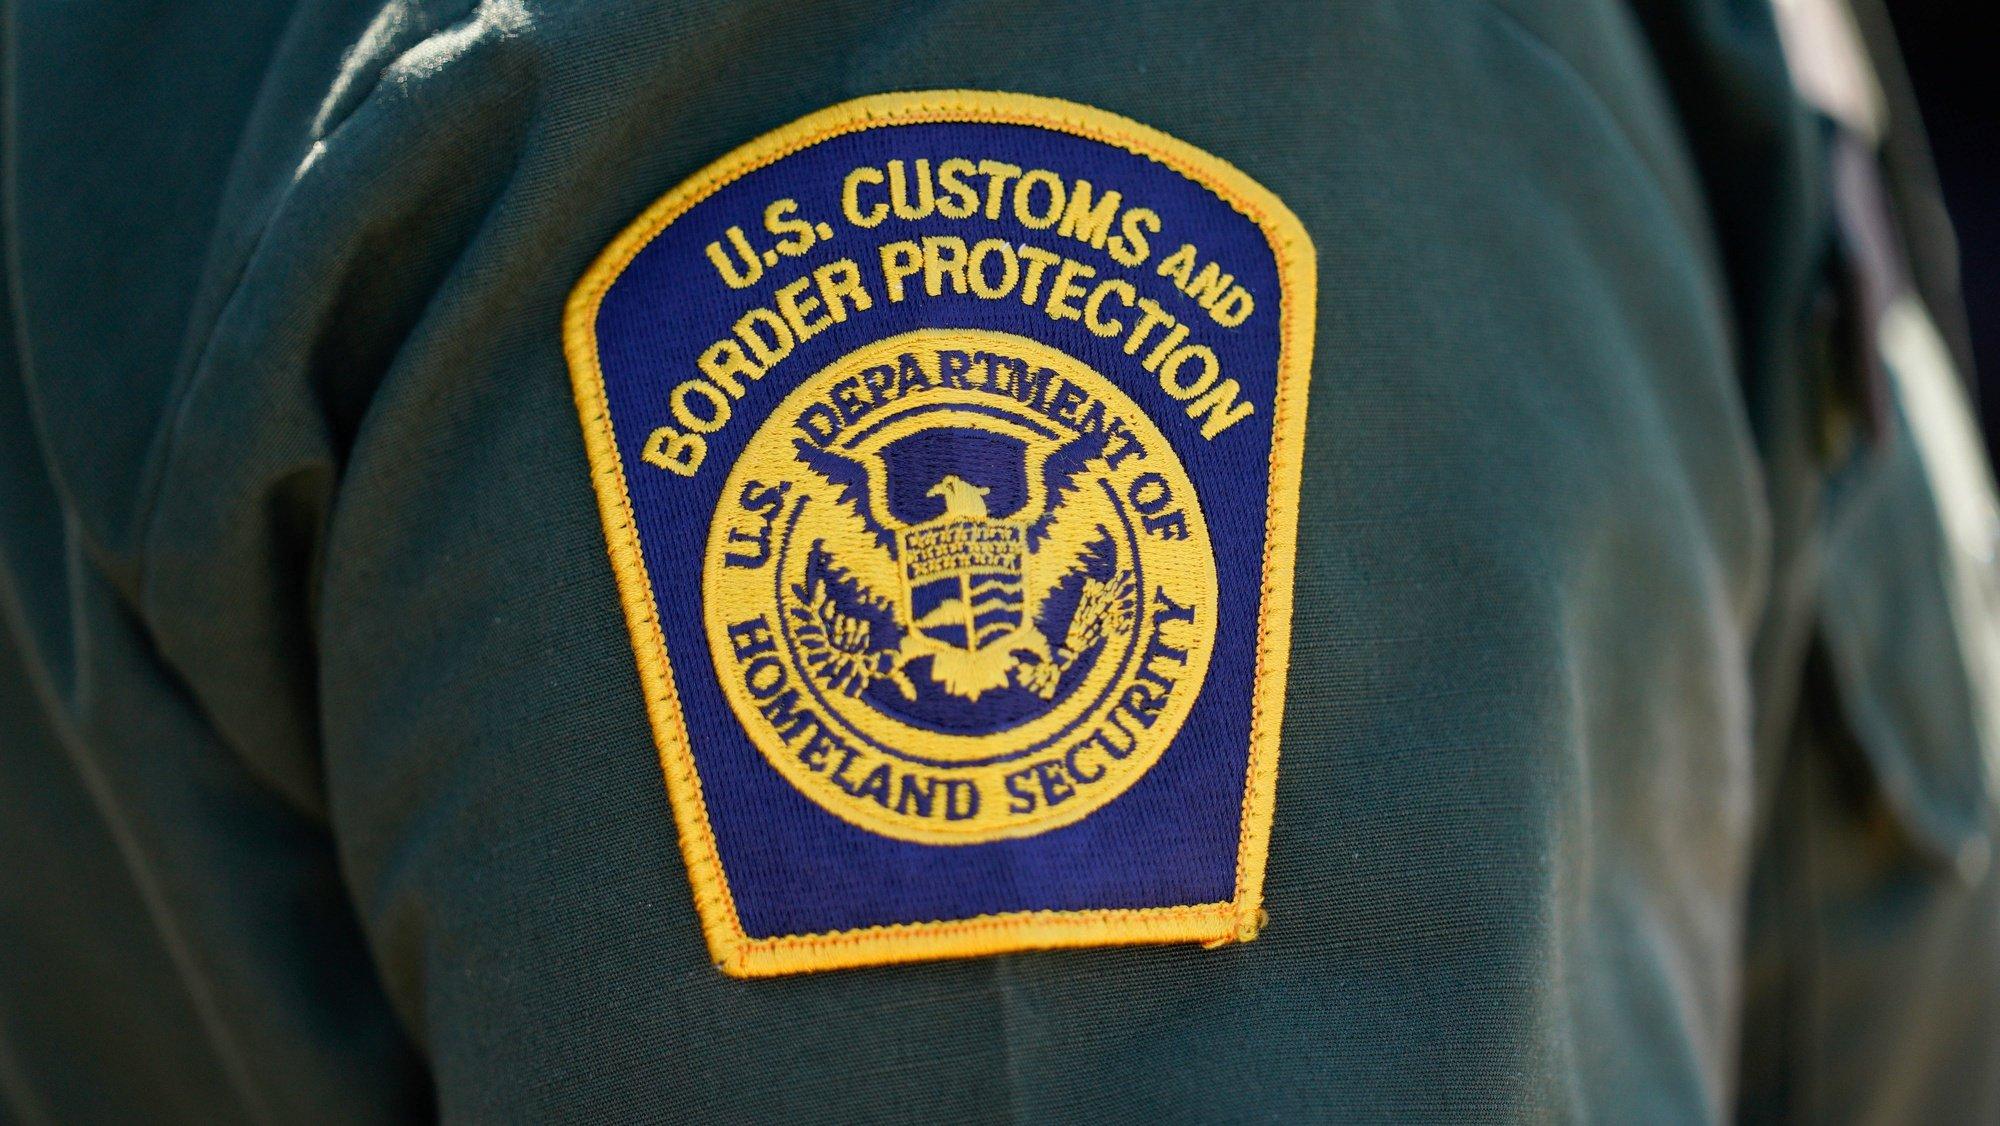 epa09301353 Badge of an El Paso area patrol officer during US Vice President Kamala Harris's visit to the El Paso Border Patrol Station in El Paso, Texas, USA, 25 June 2021.  EPA/YURI GRIPAS / POOL